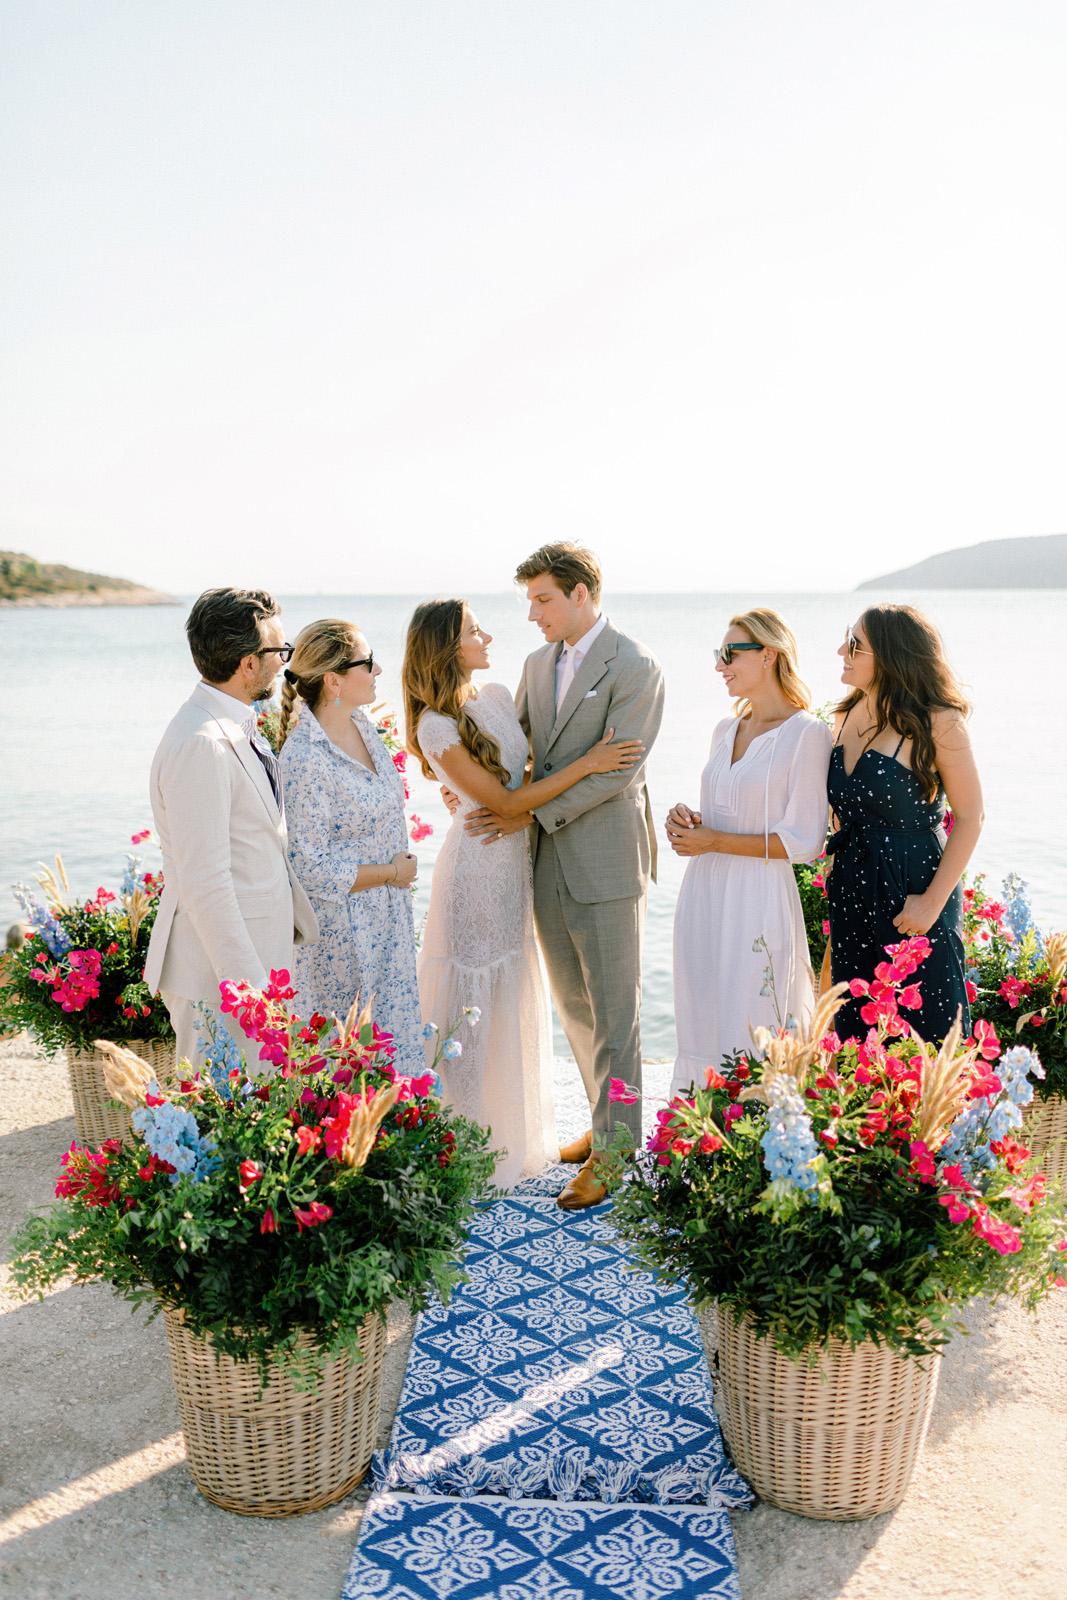 Spetses wedding 0019